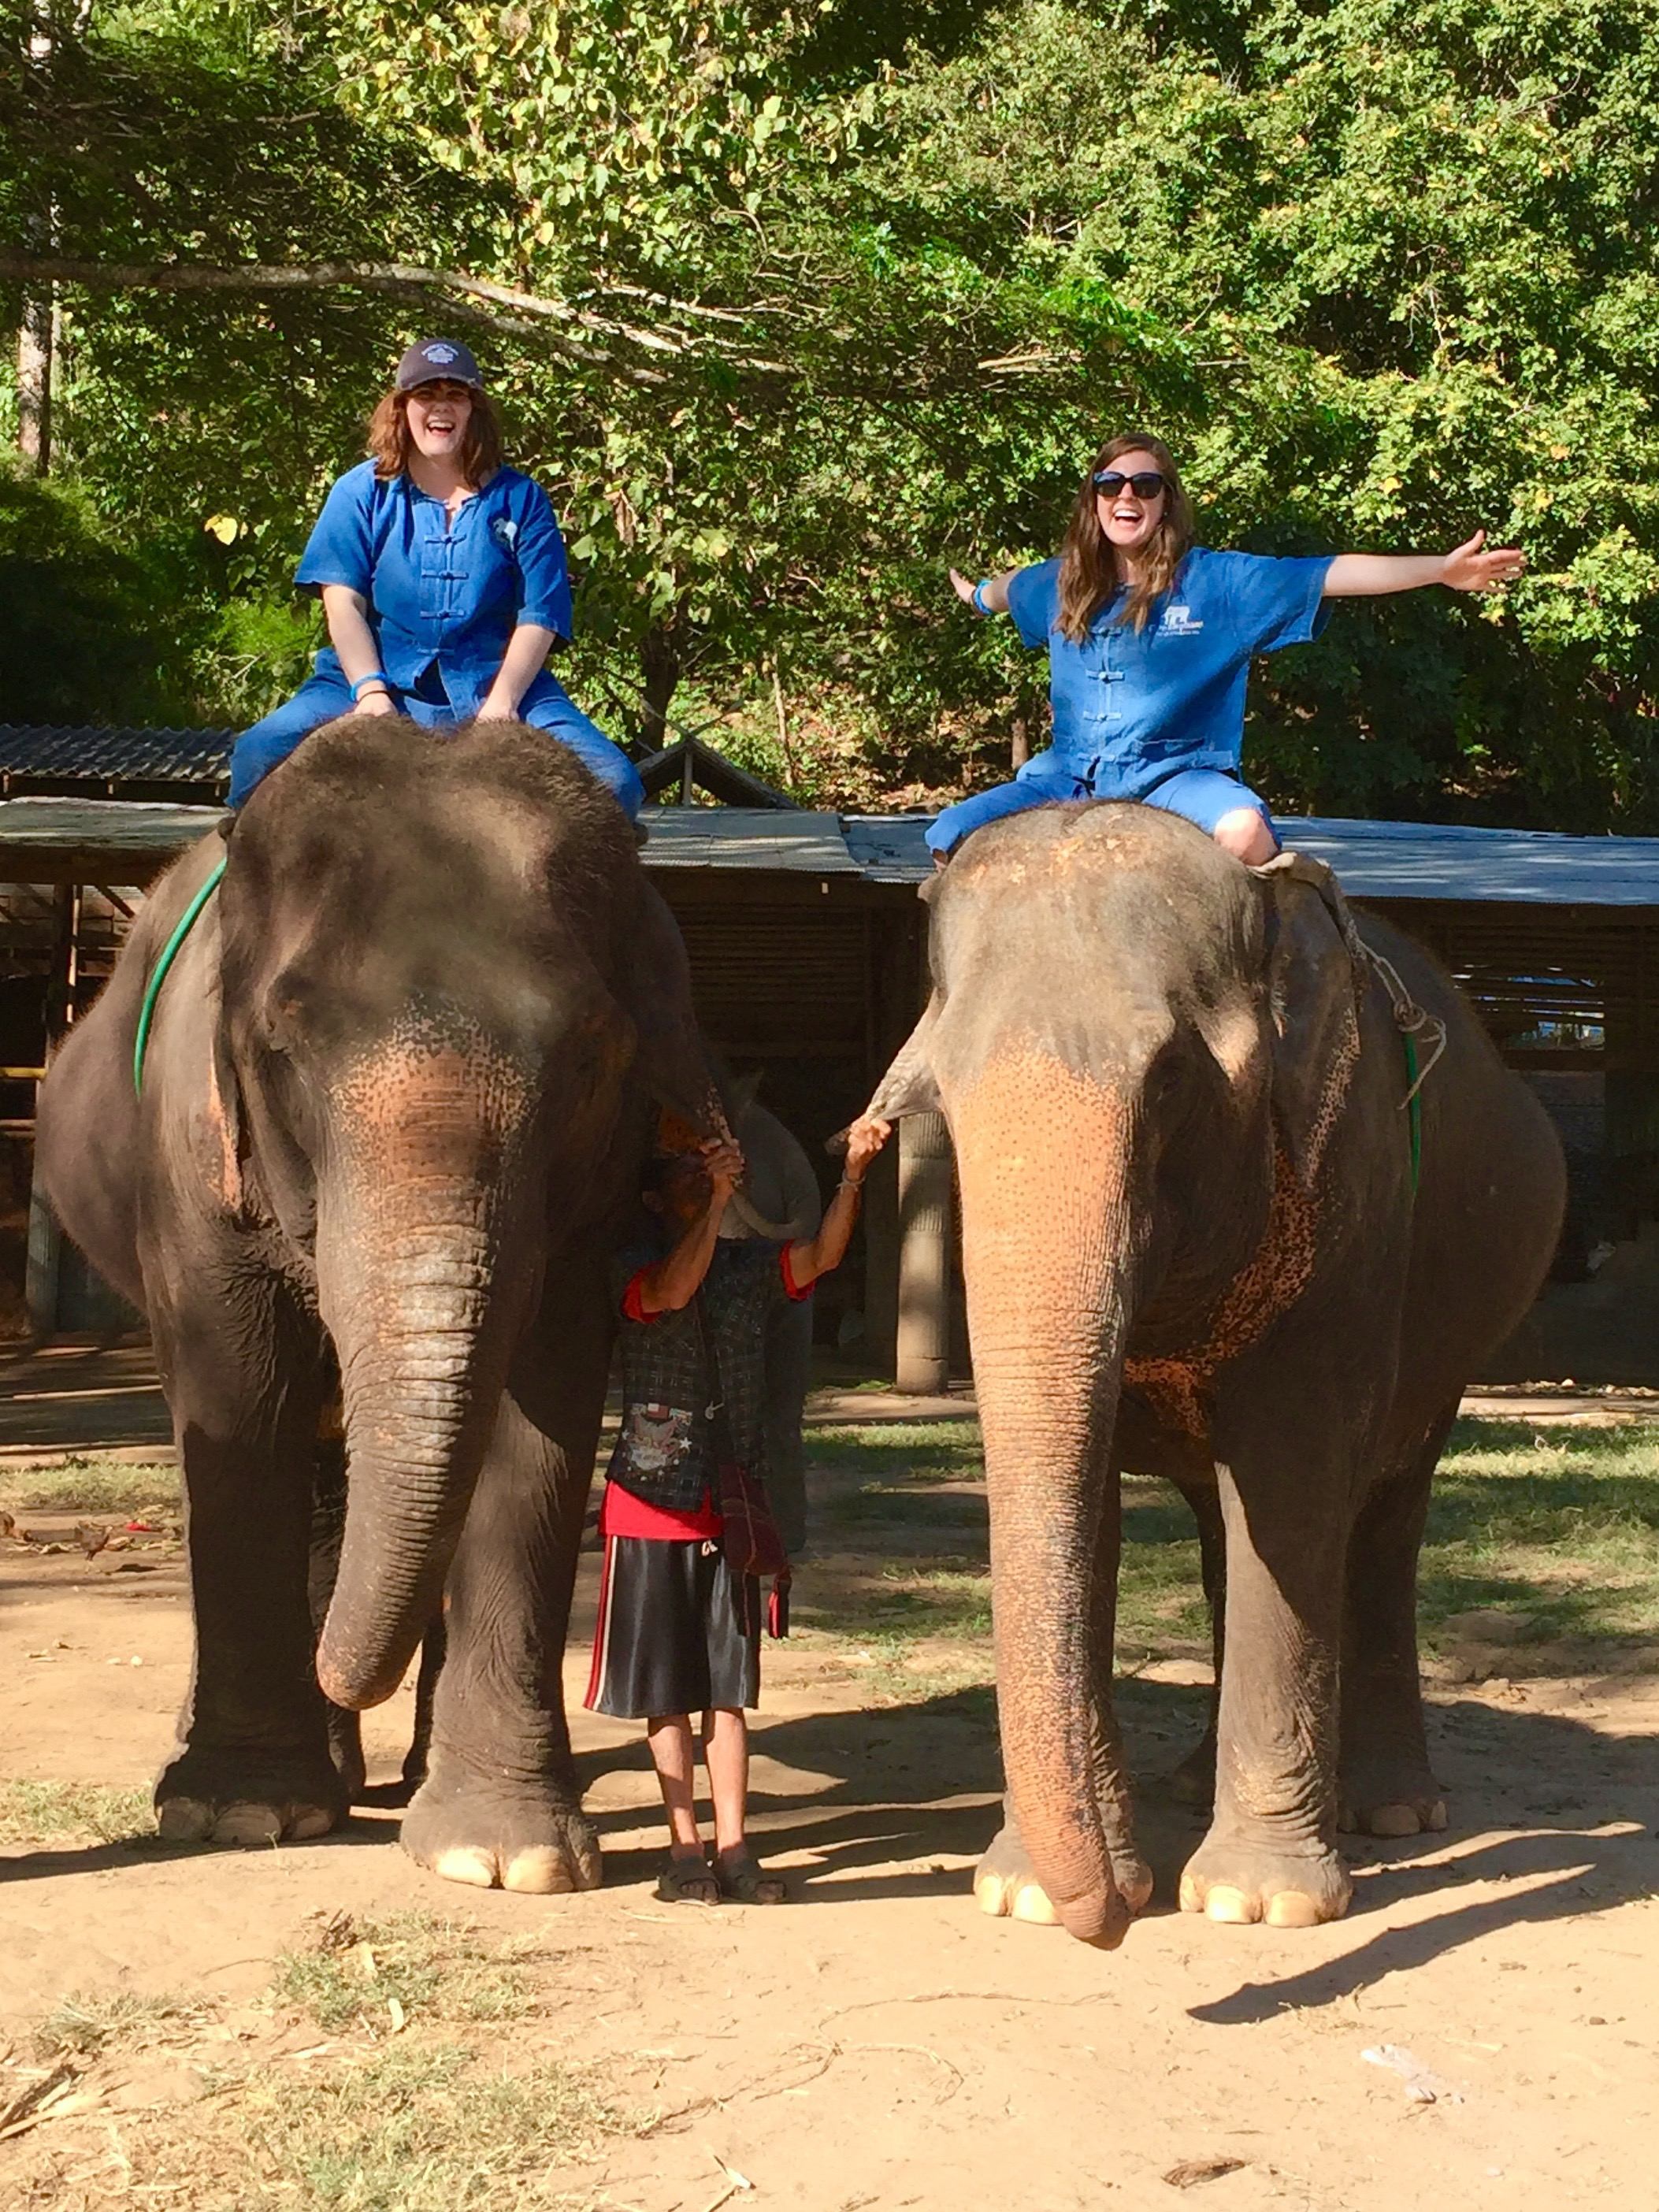 LeeAnn and I on elephants thesweetwanderlust.com